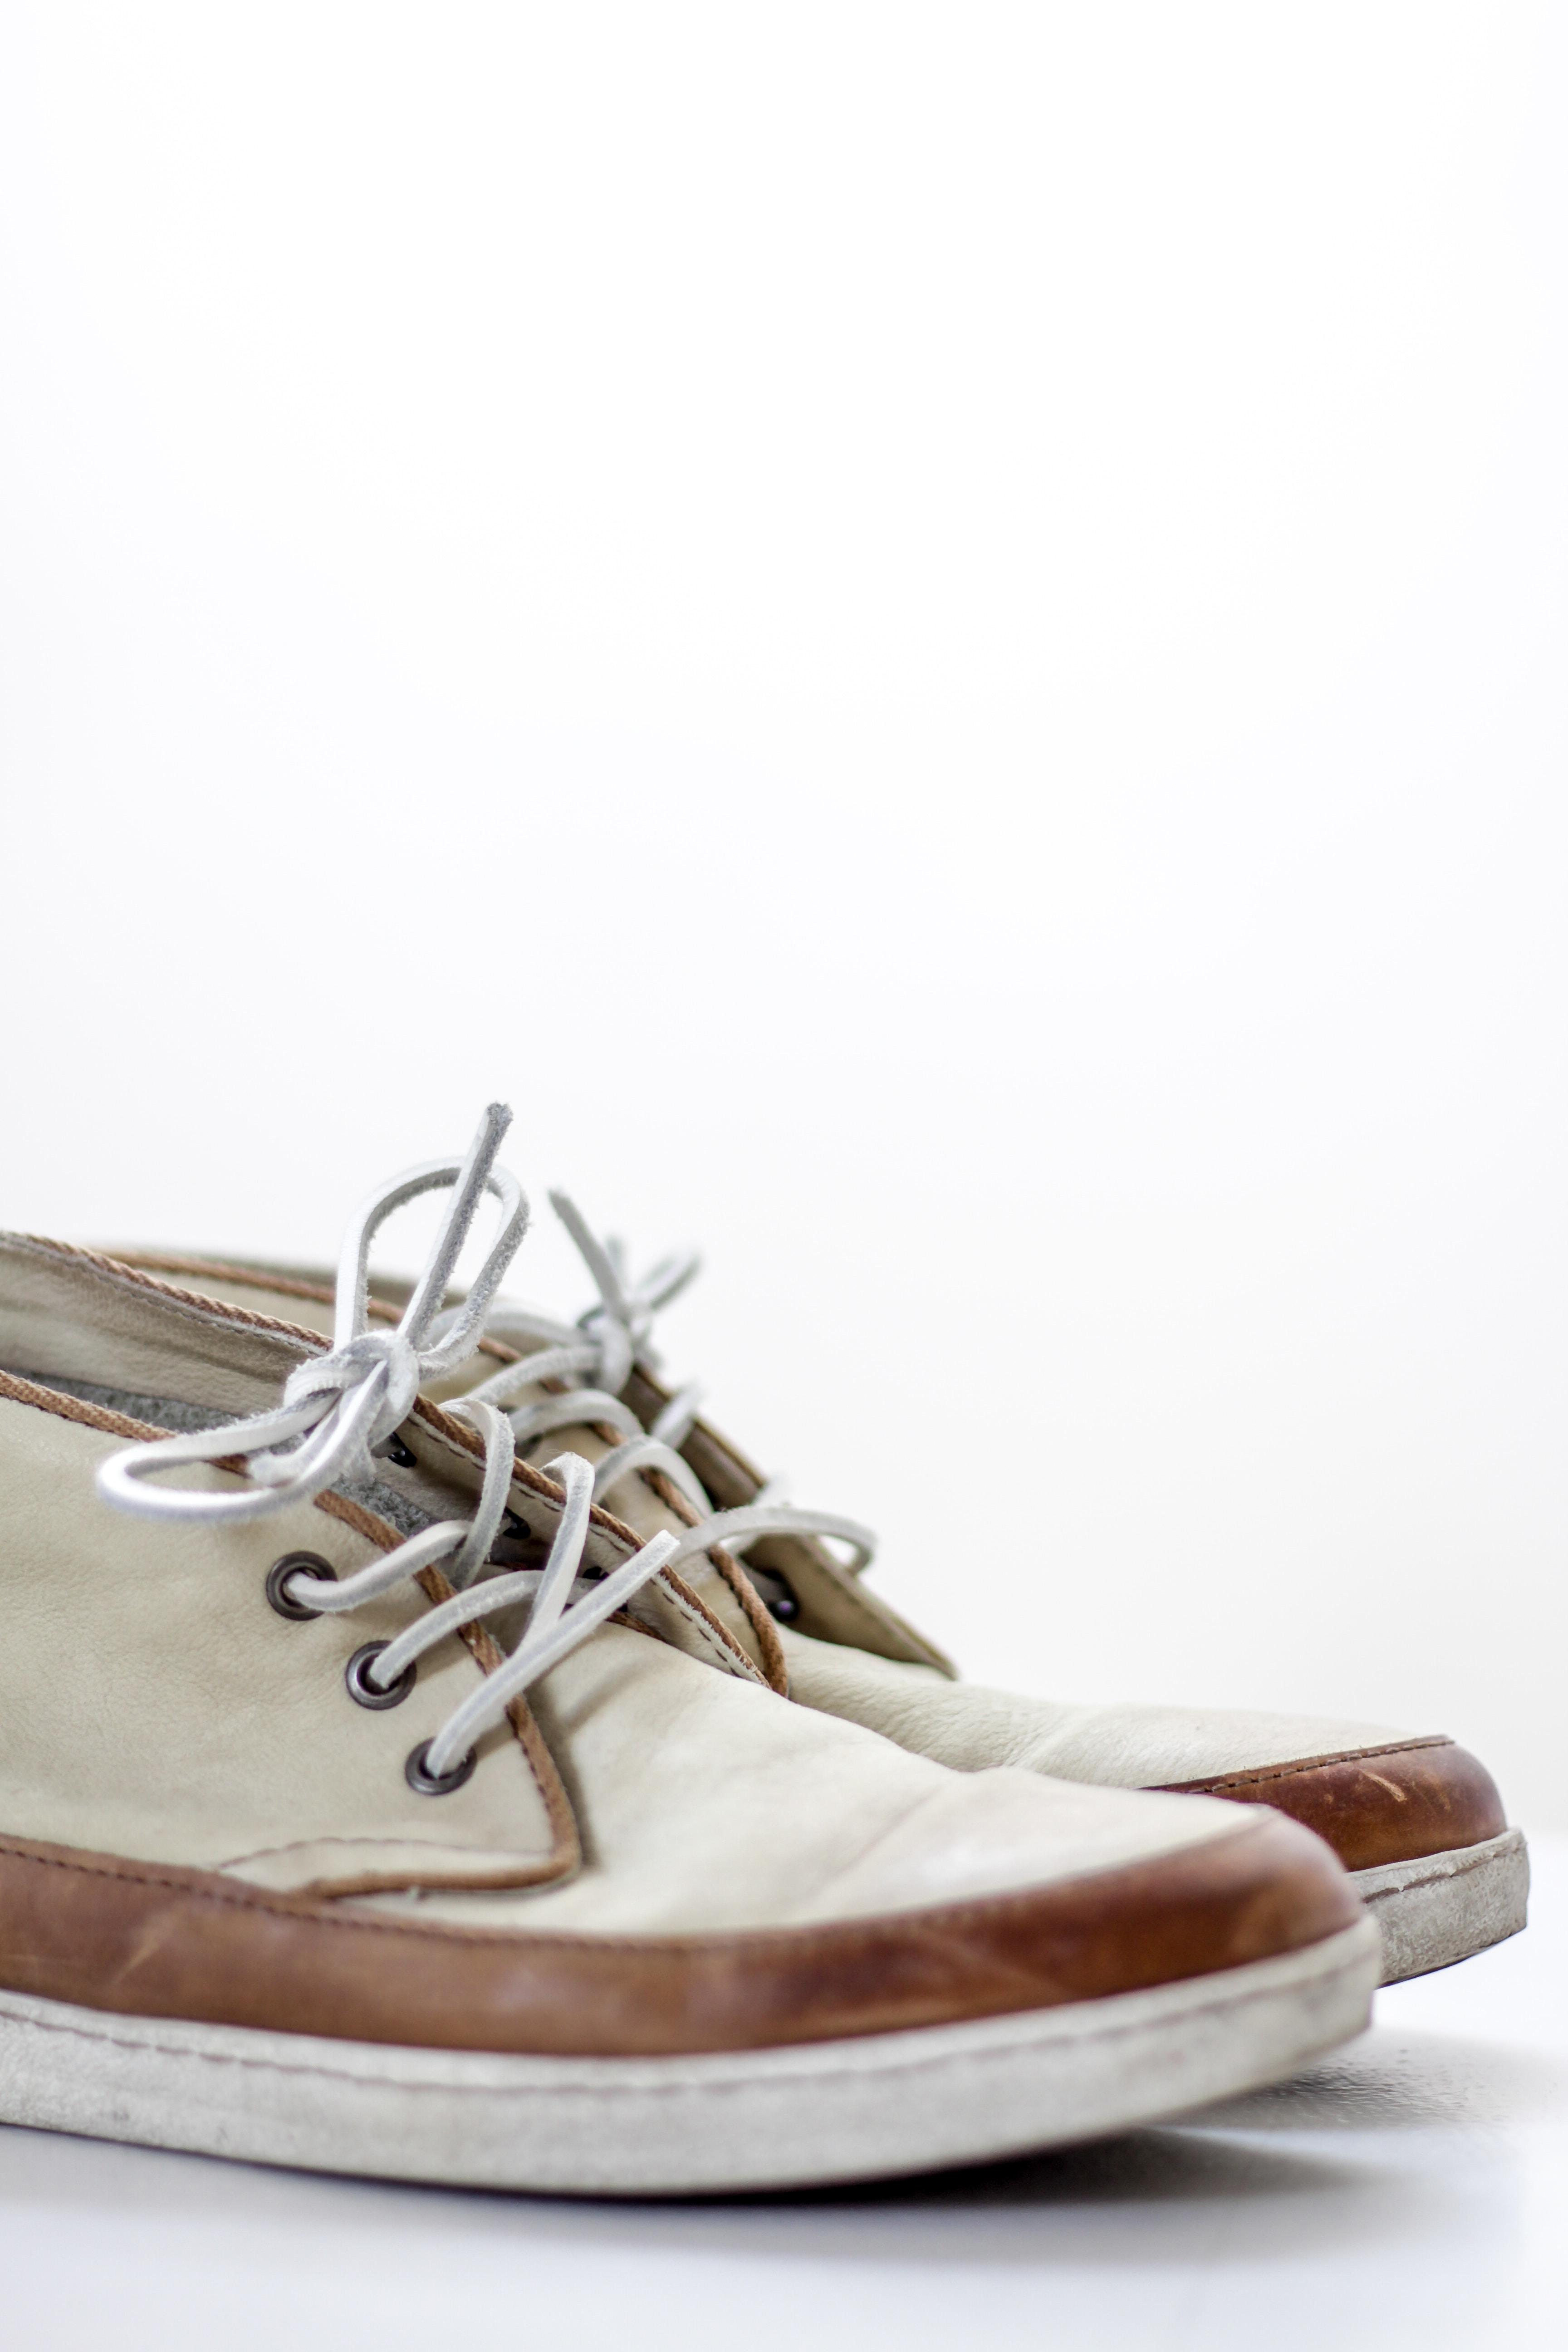 pair of beige chukka boots